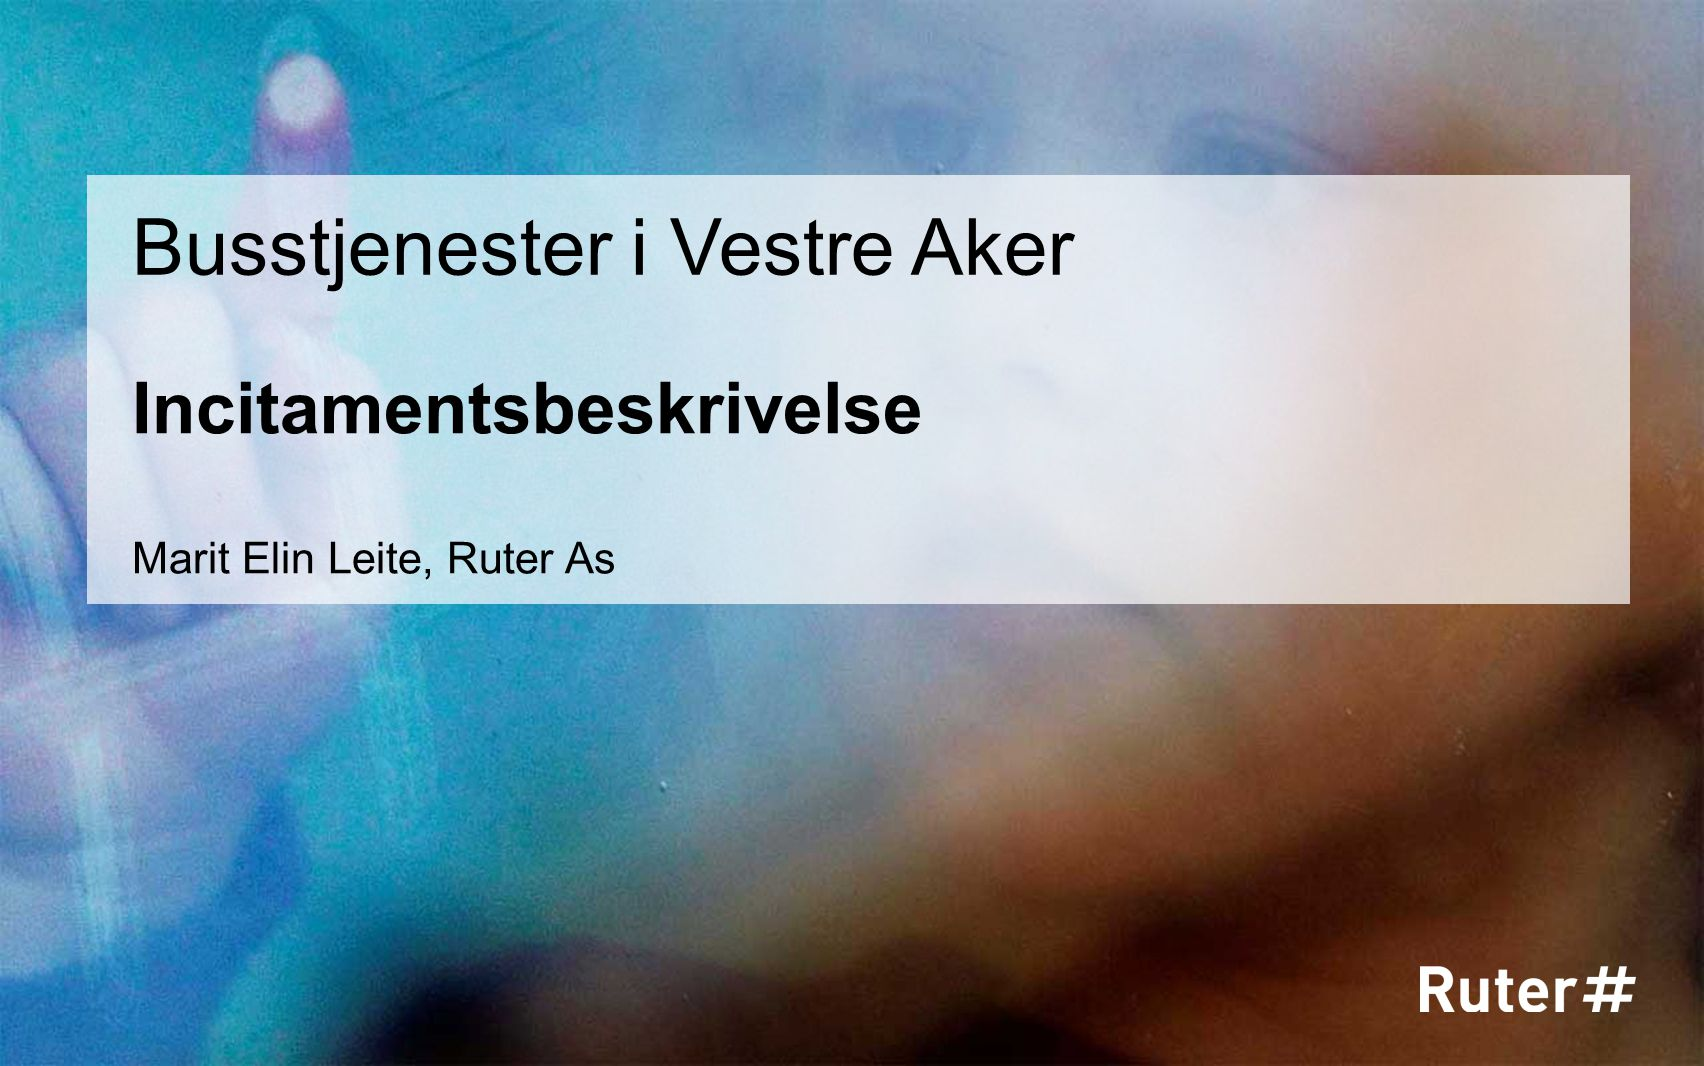 Incitamentsbeskrivelse Busstjenester i Vestre Aker Marit Elin Leite, Ruter As